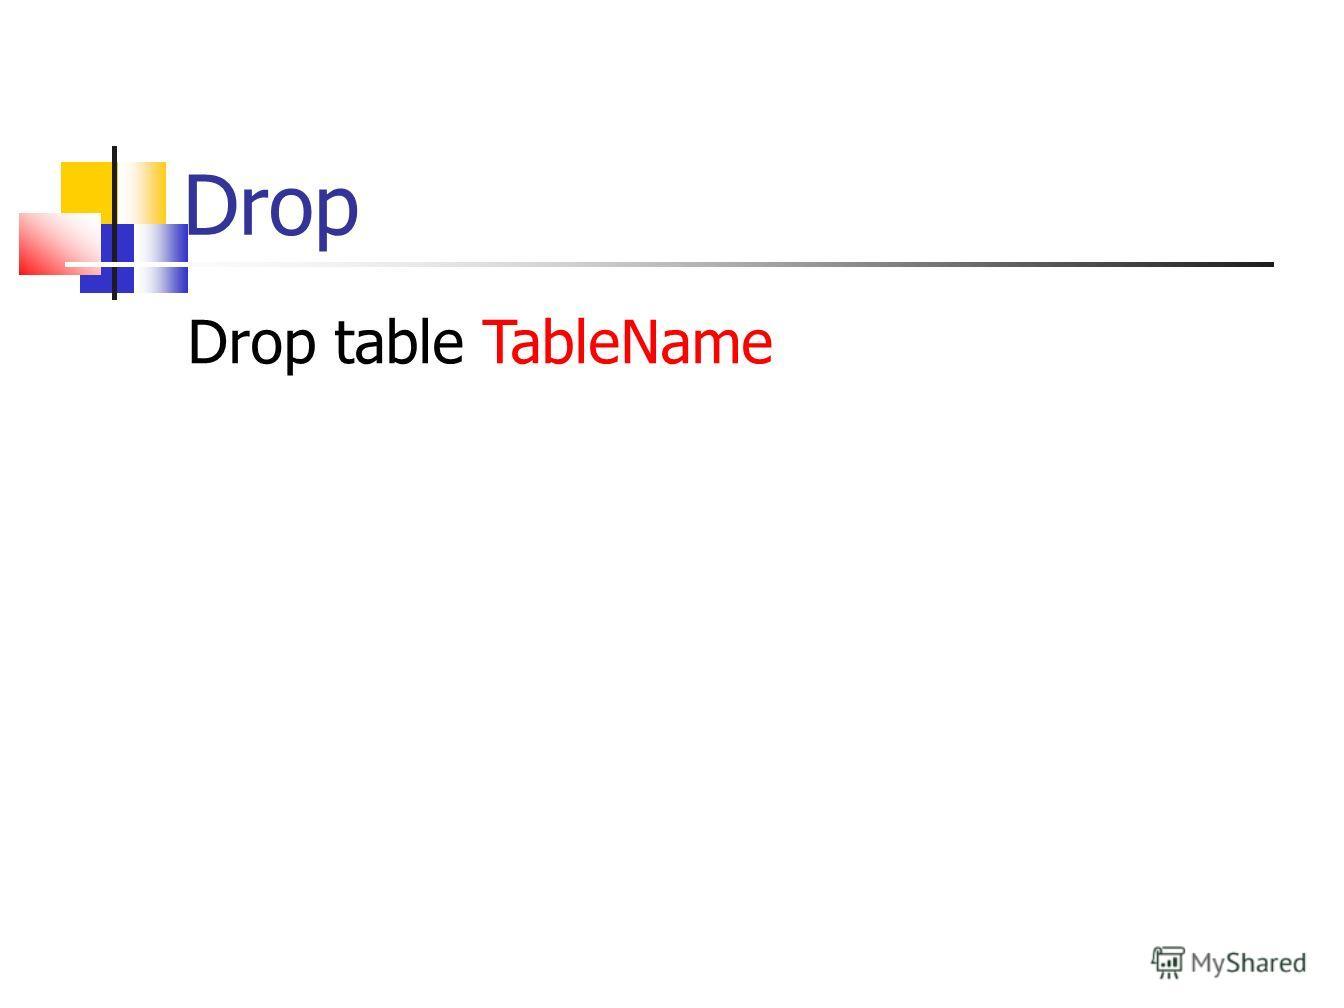 Drop Drop table TableName